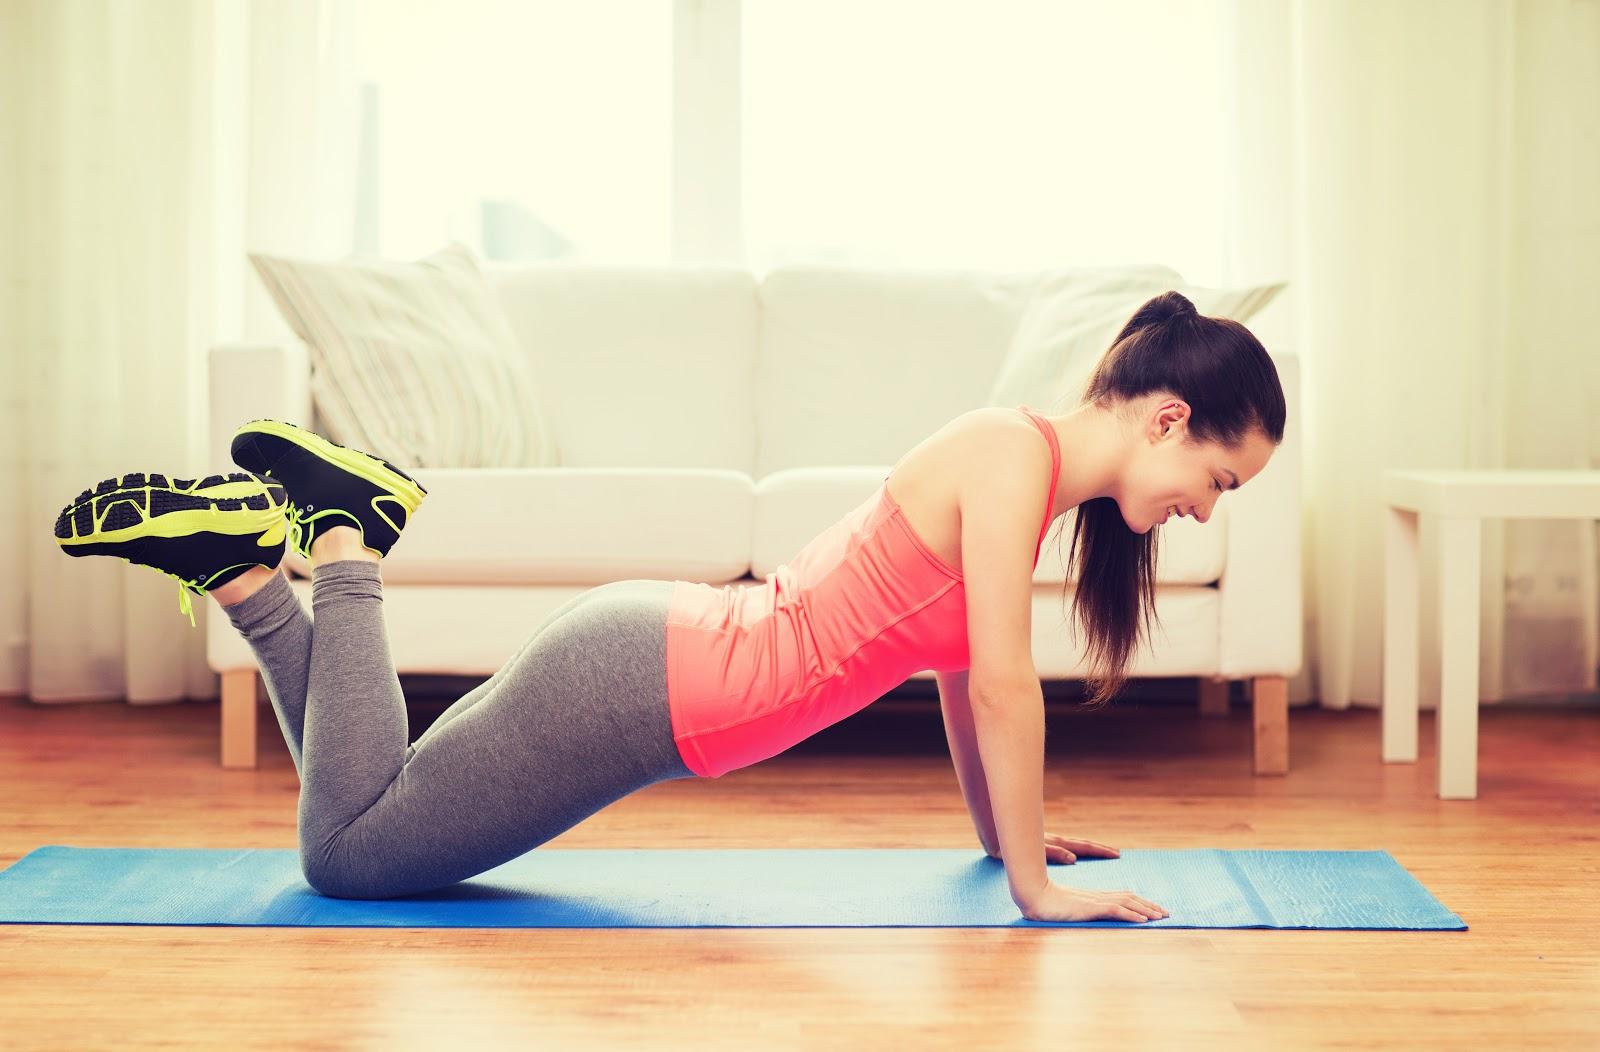 mulher se exercitando na sala